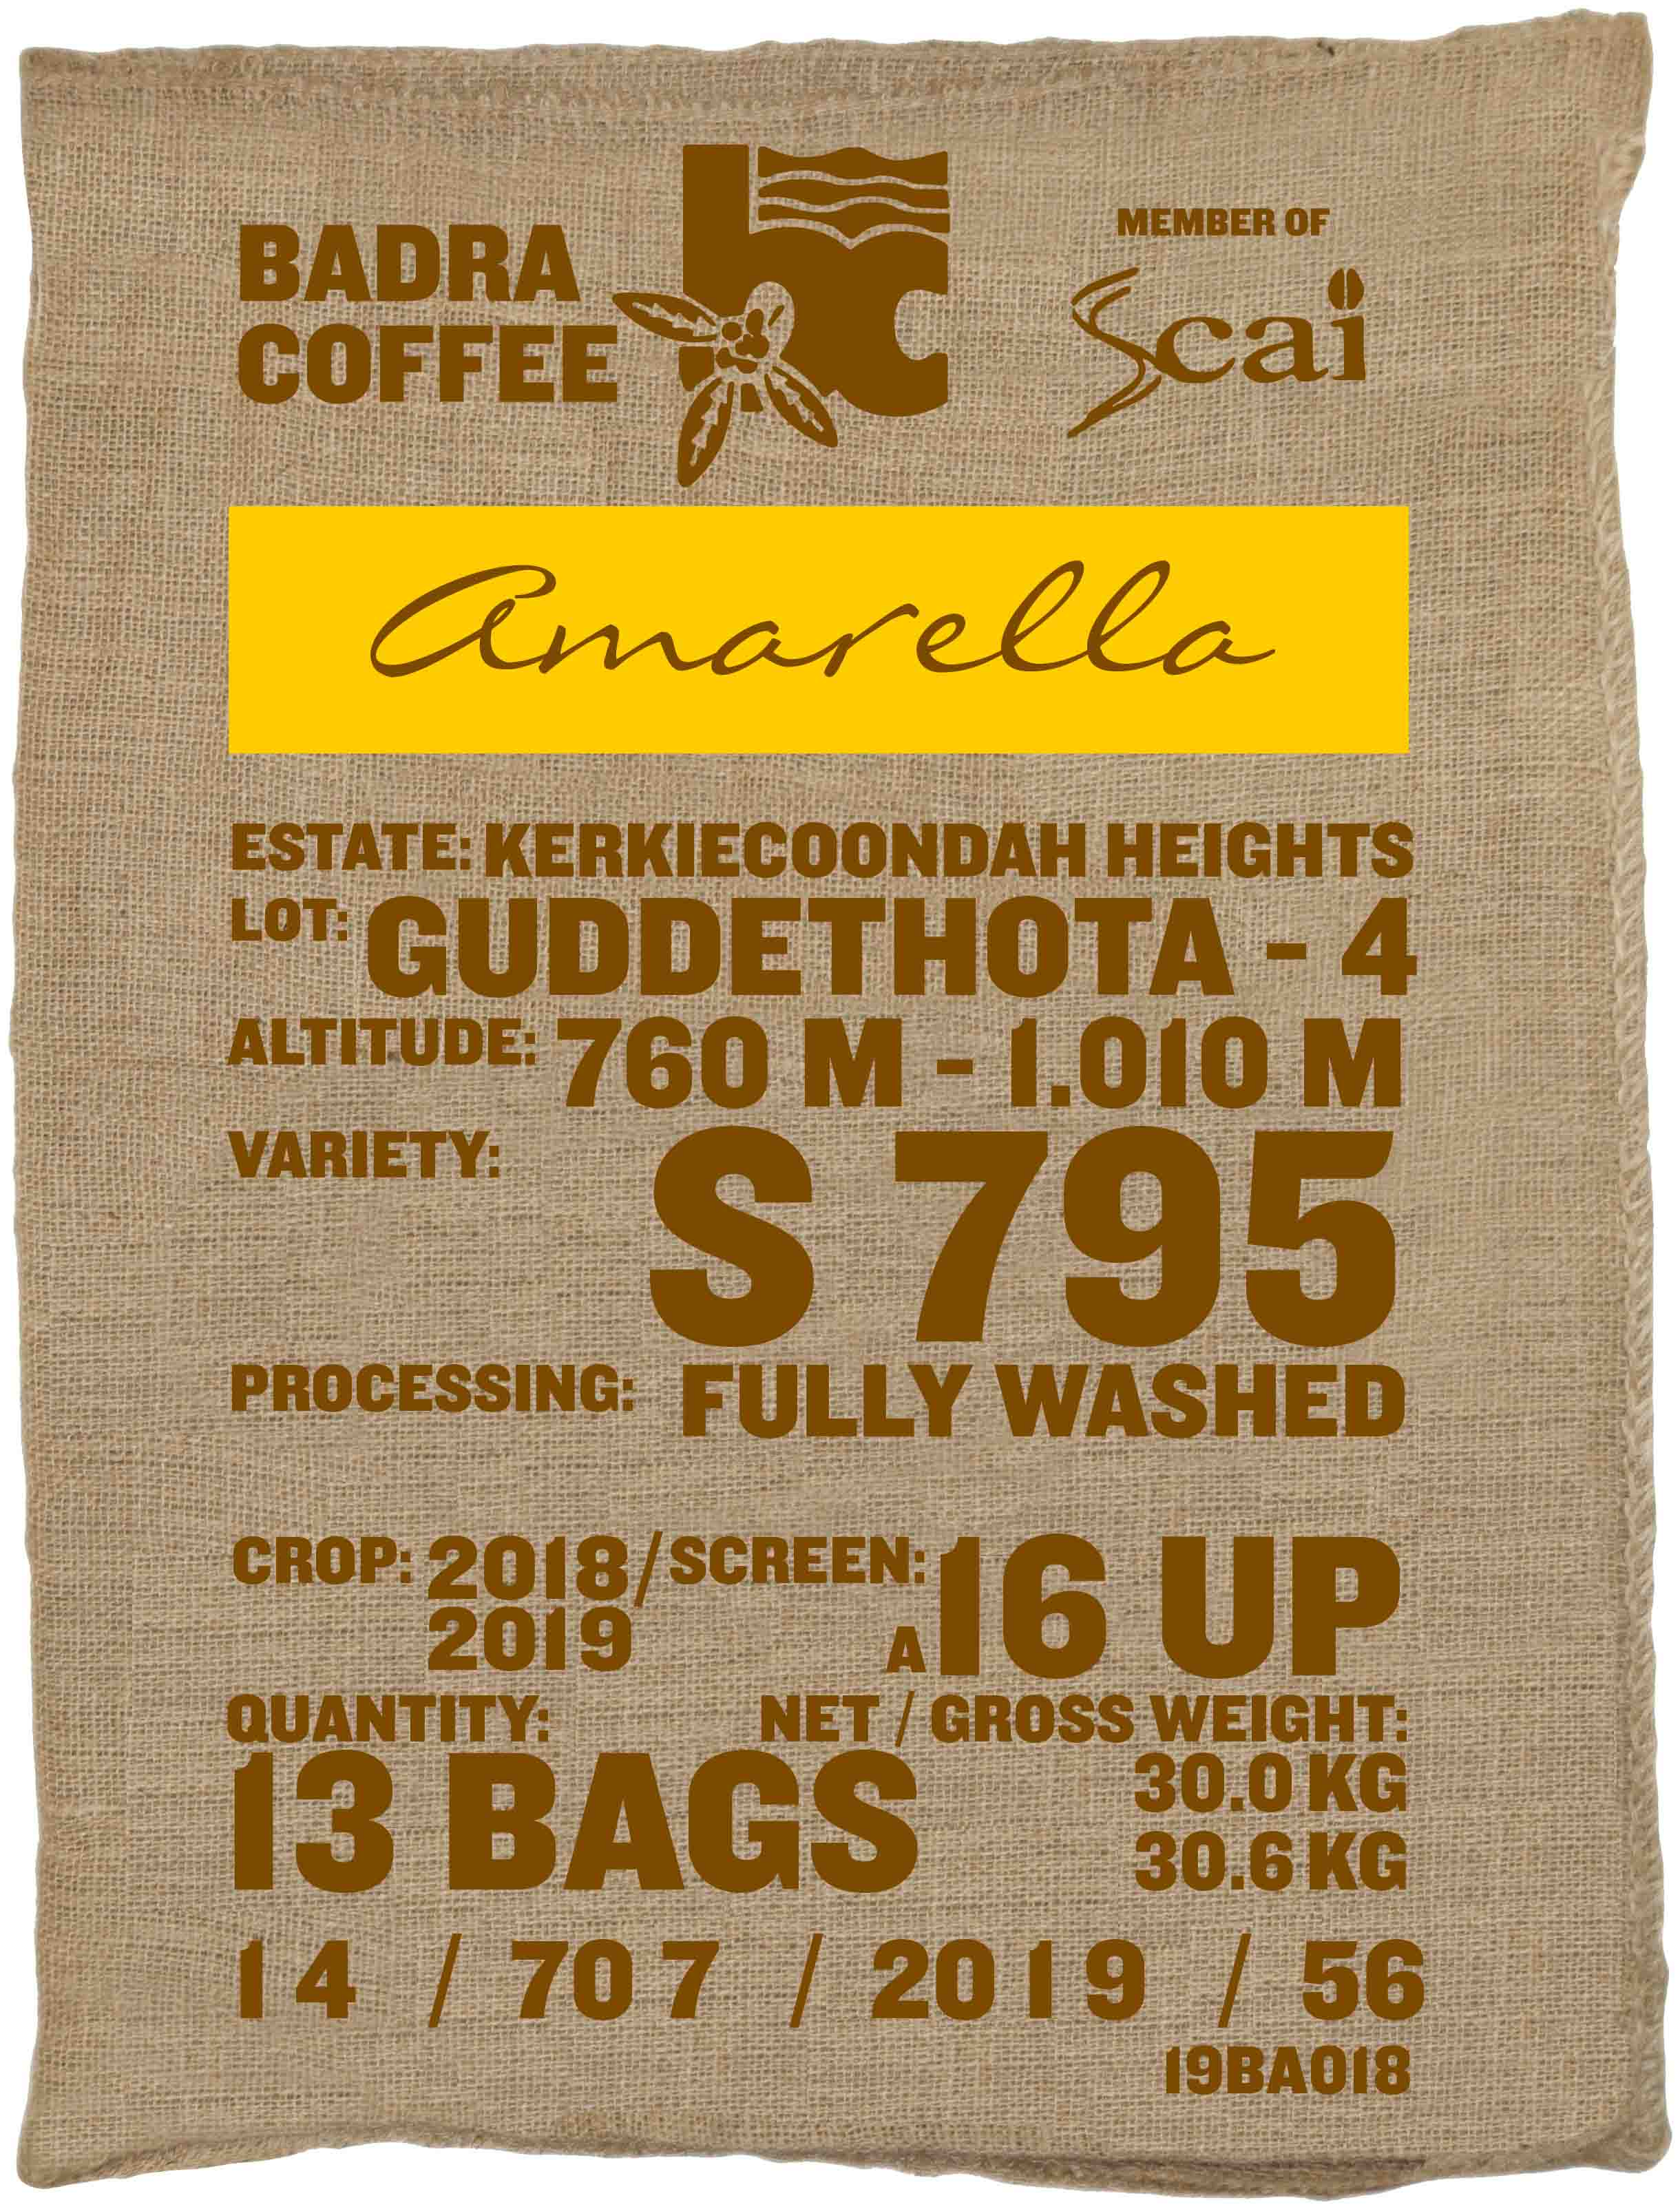 Ein Sack amarella Rohkaffee Varietät S795. Badra Estates Lot Guddethota 4.